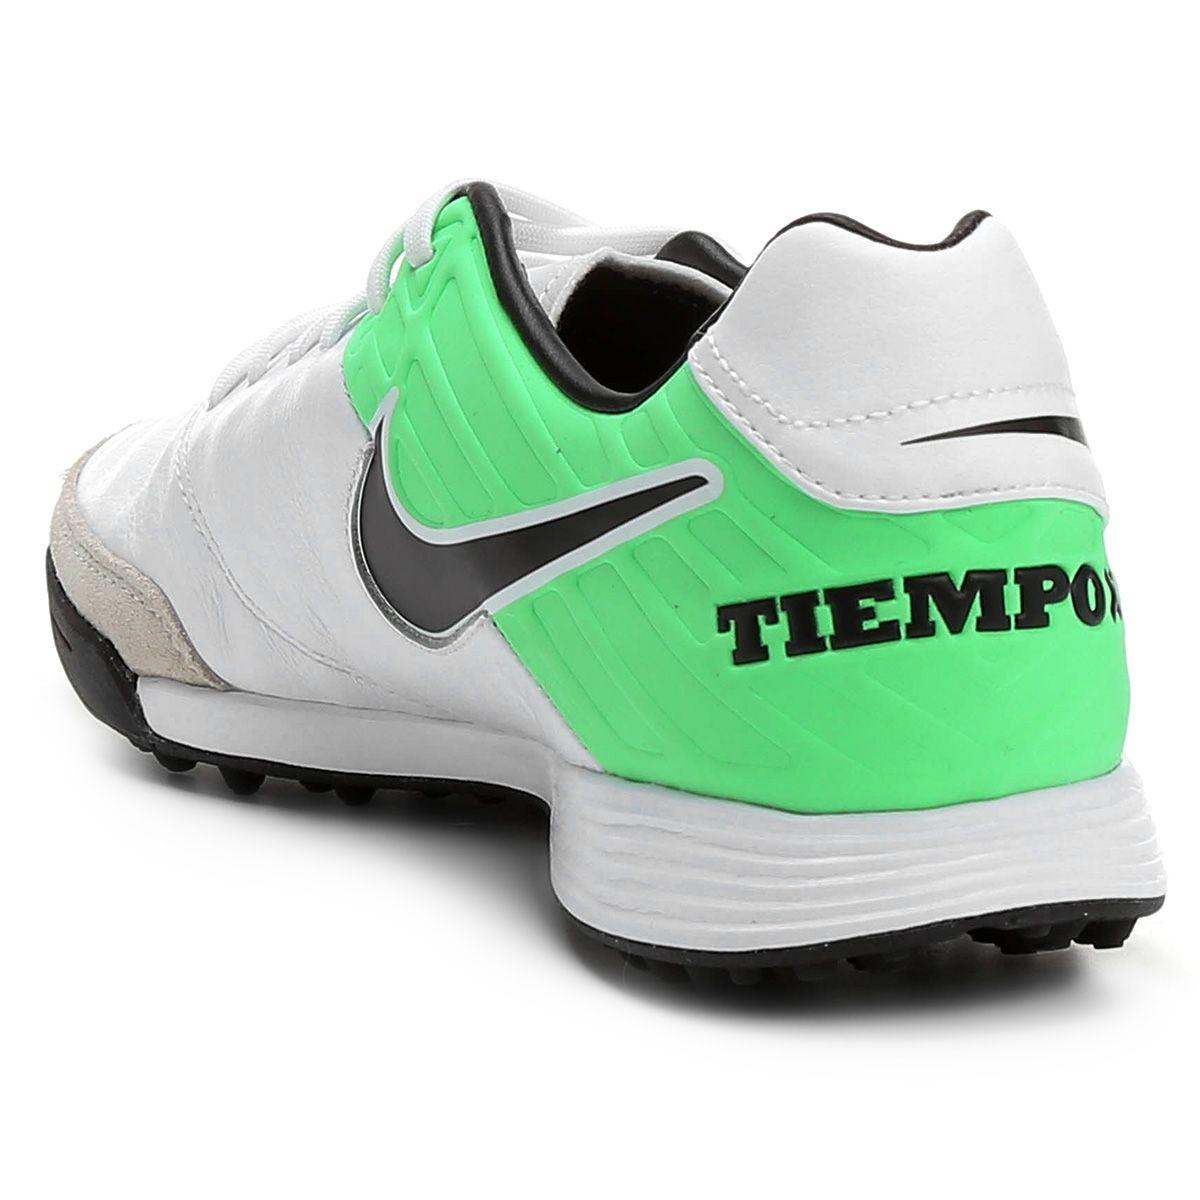 524f811d2f Chuteira Society Nike Tiempo Mystic 5 TF Masculina - BRACIA SHOP ...